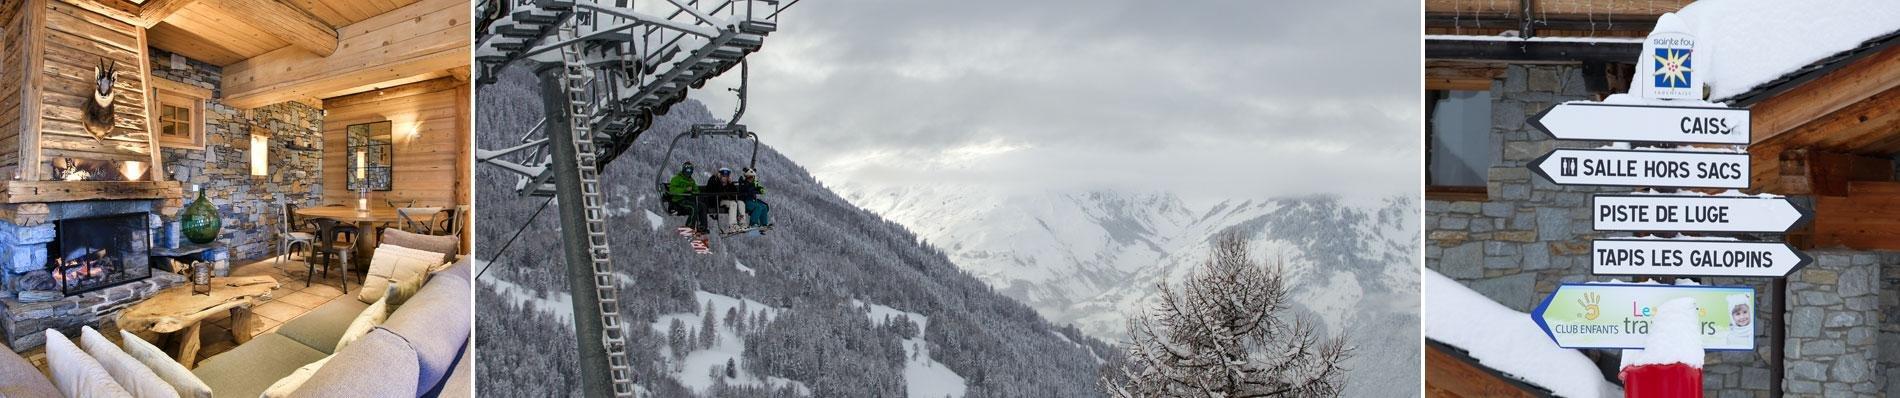 sainte foy chalet white eden ski frankrijk wintersport